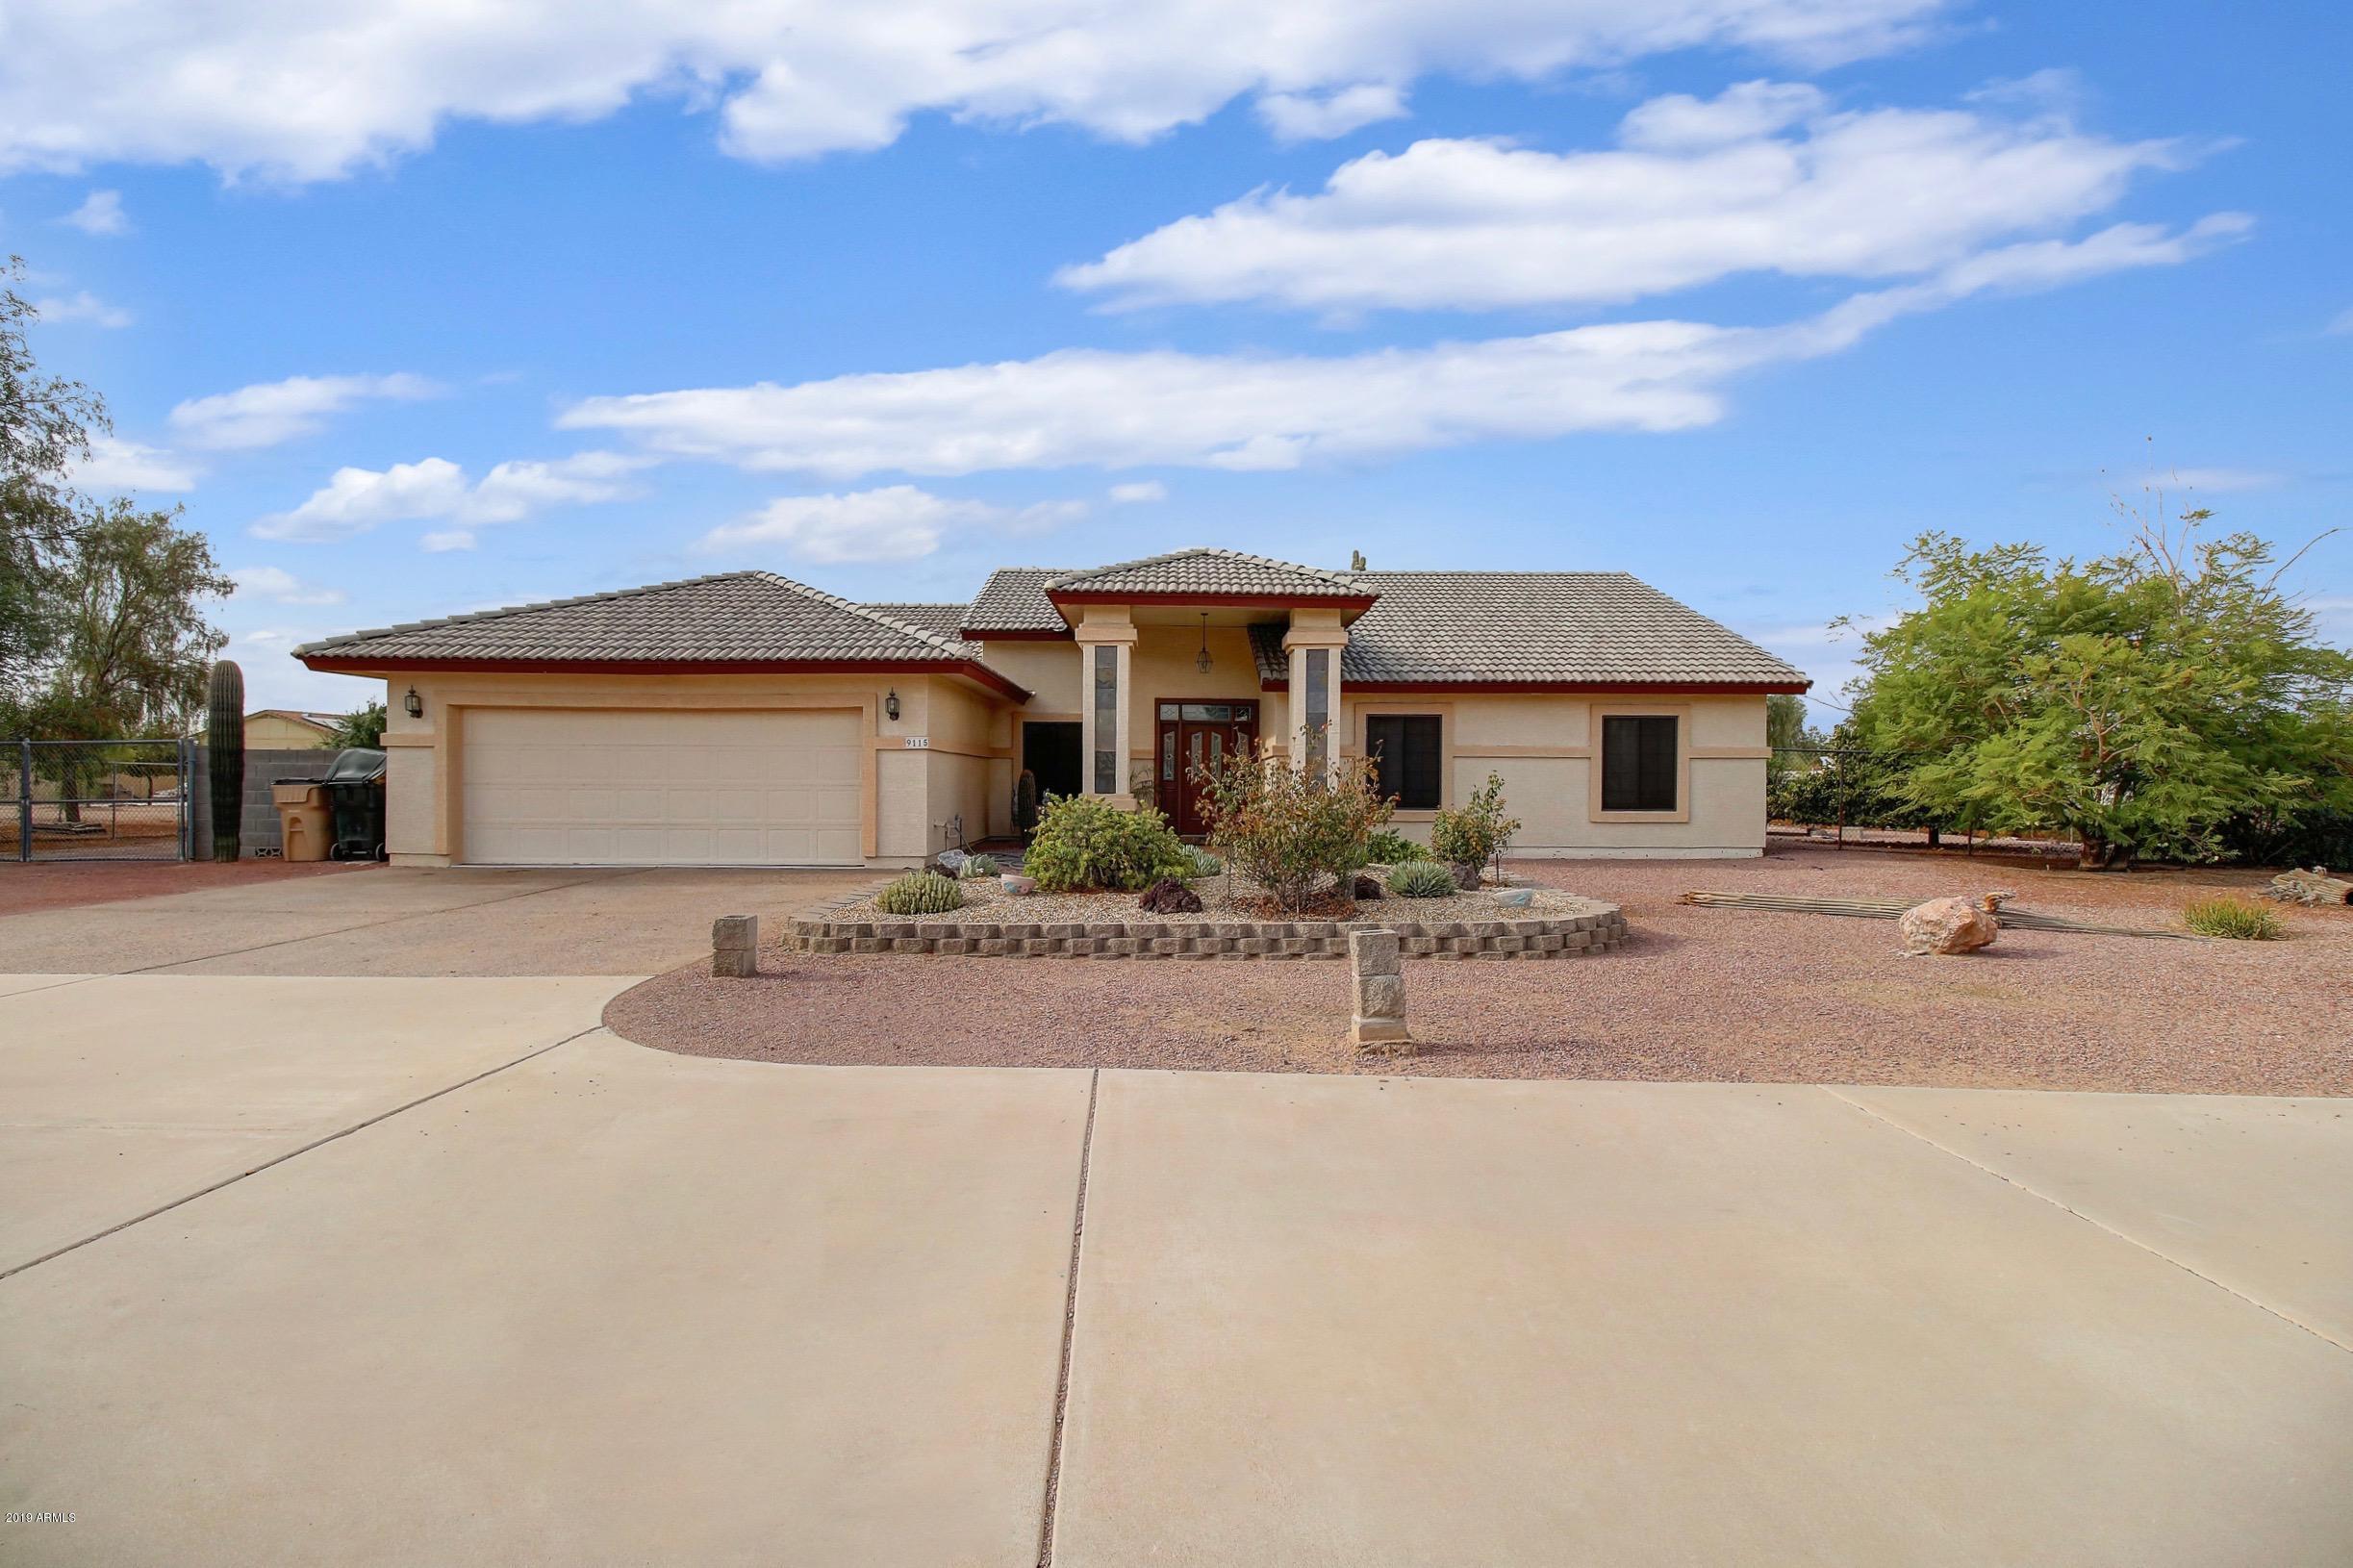 9115 W VILLA LINDO Drive, Peoria, Arizona